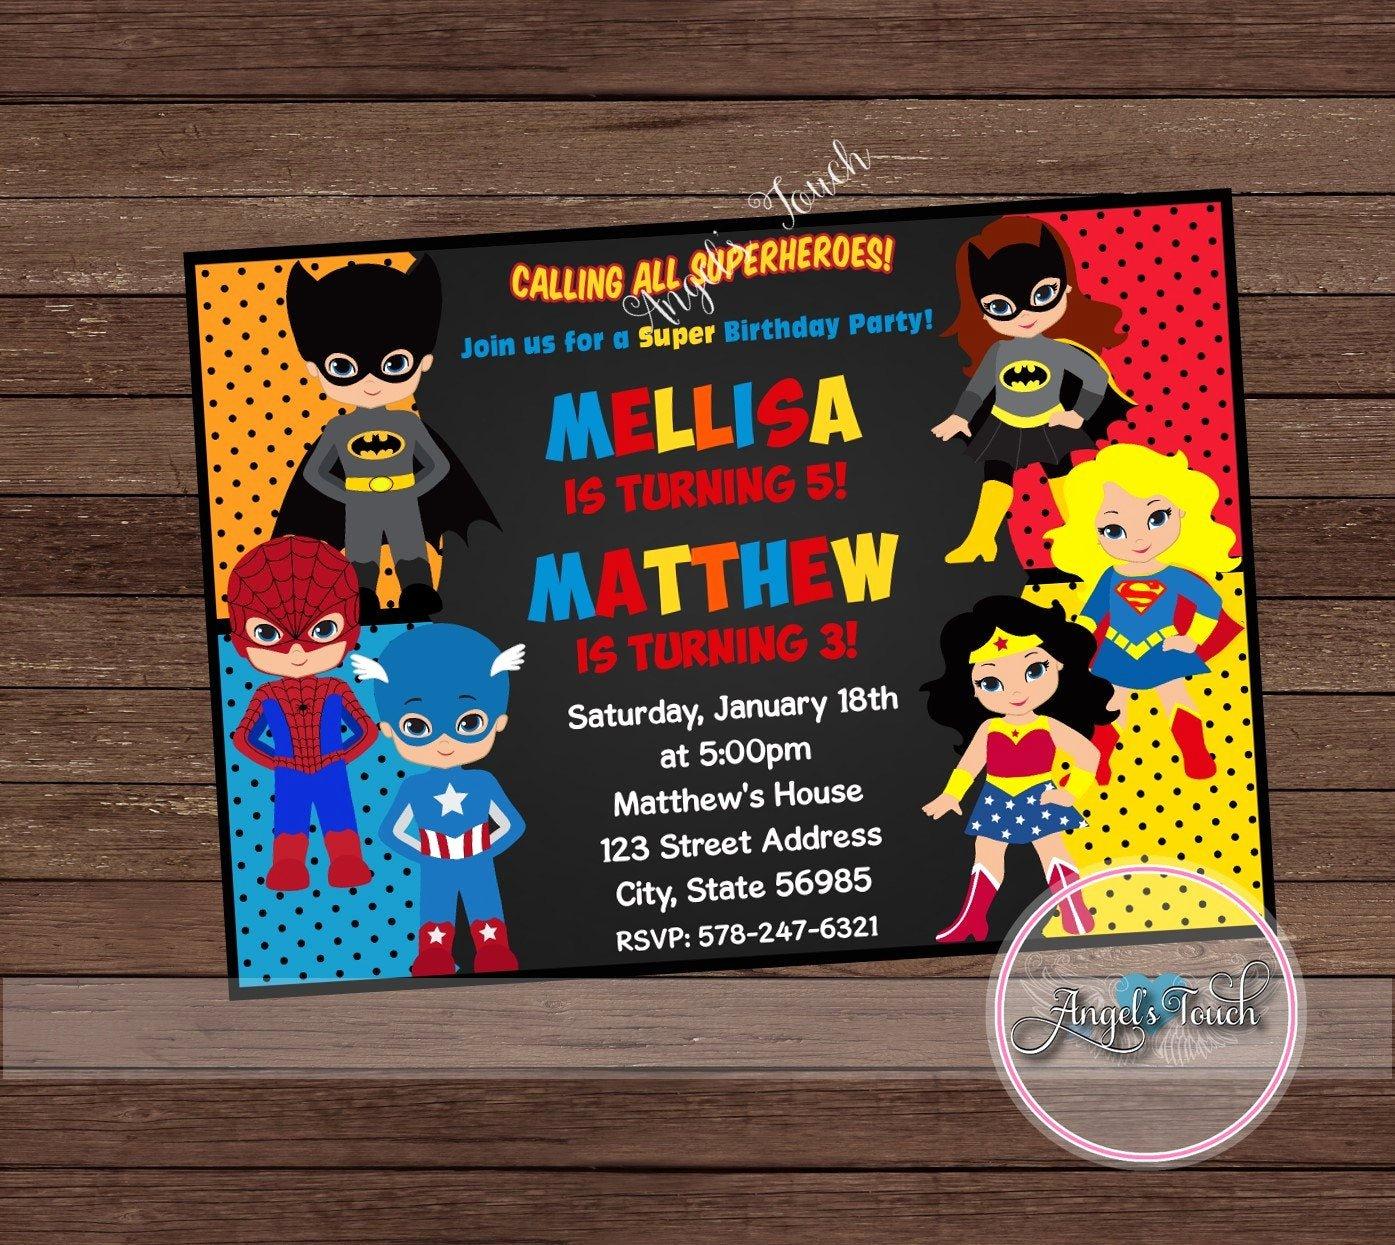 Superhero Birthday Party Invitations Beautiful Super Hero Party Invitation Superheroes Birthday Invitation